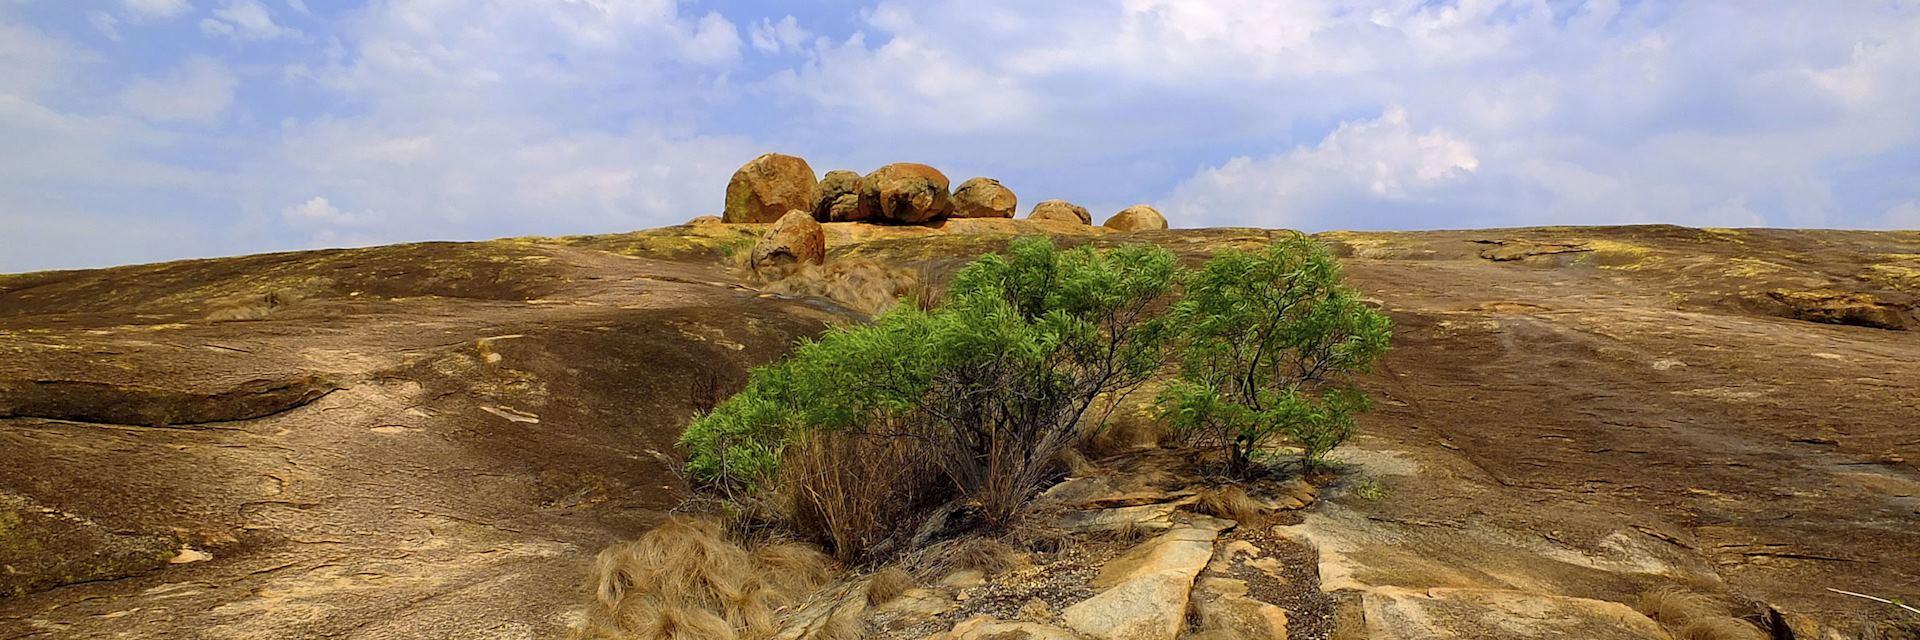 Balancing rocks in the Matobo Hills